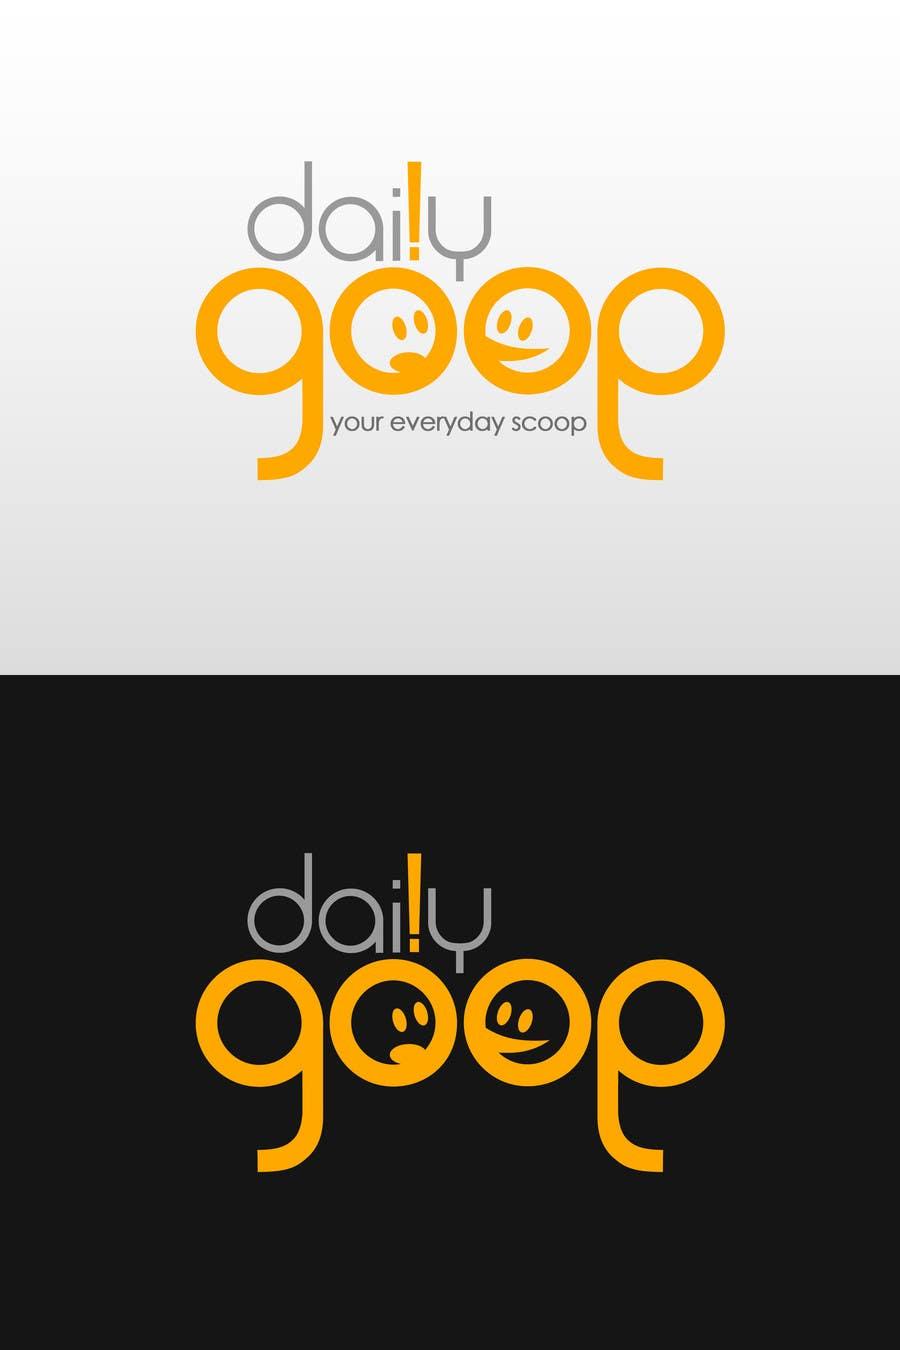 Kilpailutyö #30 kilpailussa Design a Logo for http://dailygoop.com